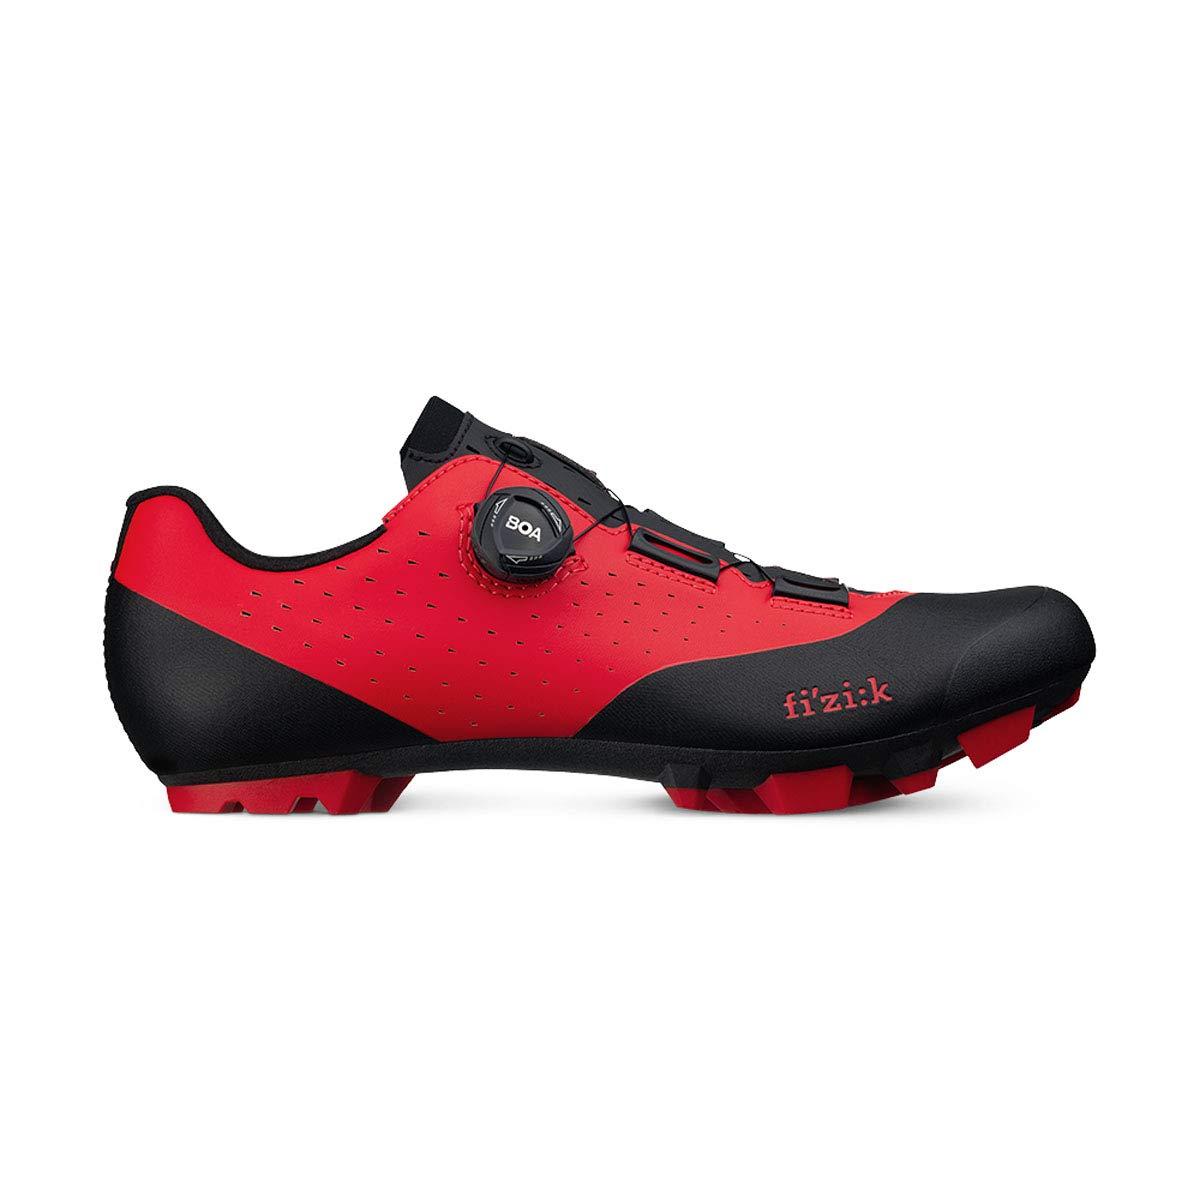 Fizik(フィジーク) Vento Overcurve X3 Cycling Shoes - Red/Black 42.5  B07HYVJ6PV